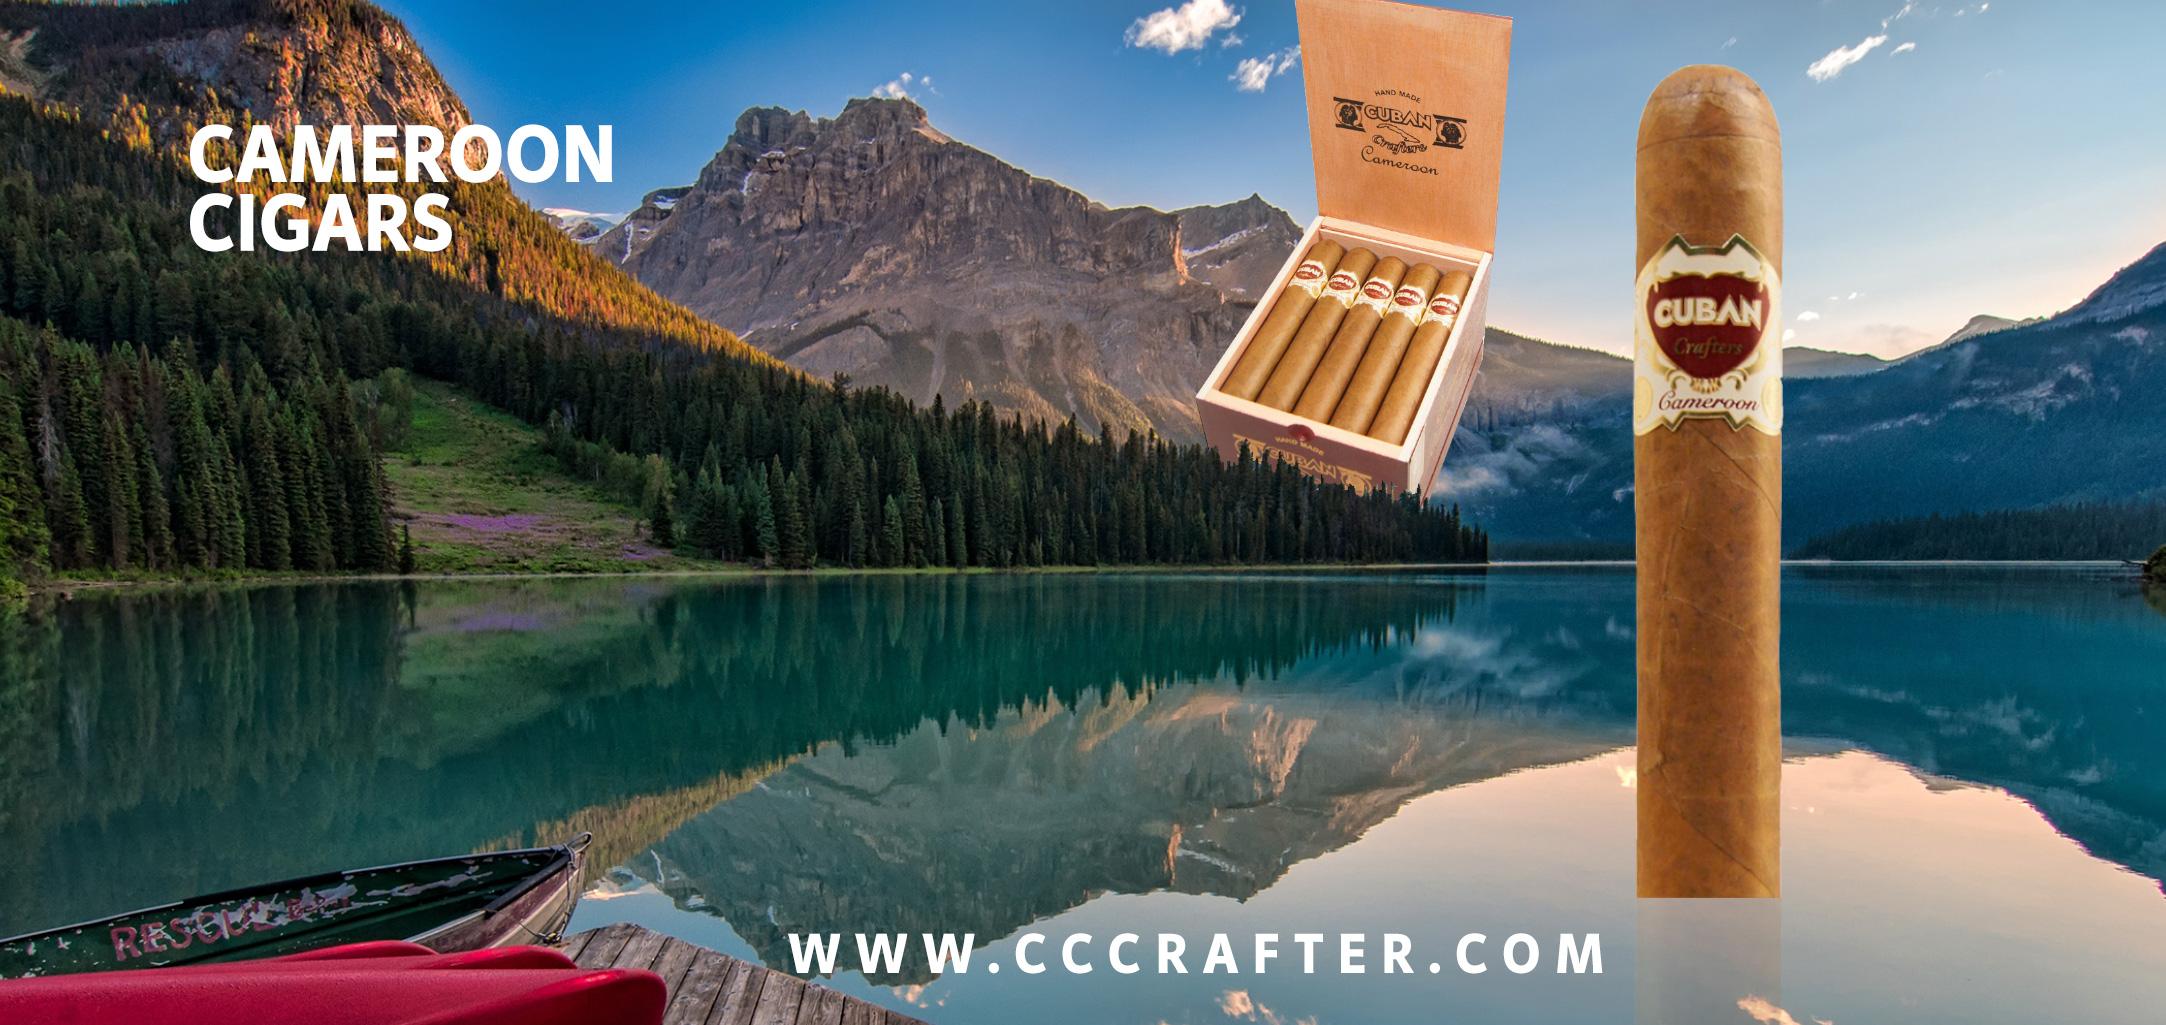 cameroon-cigars.jpg